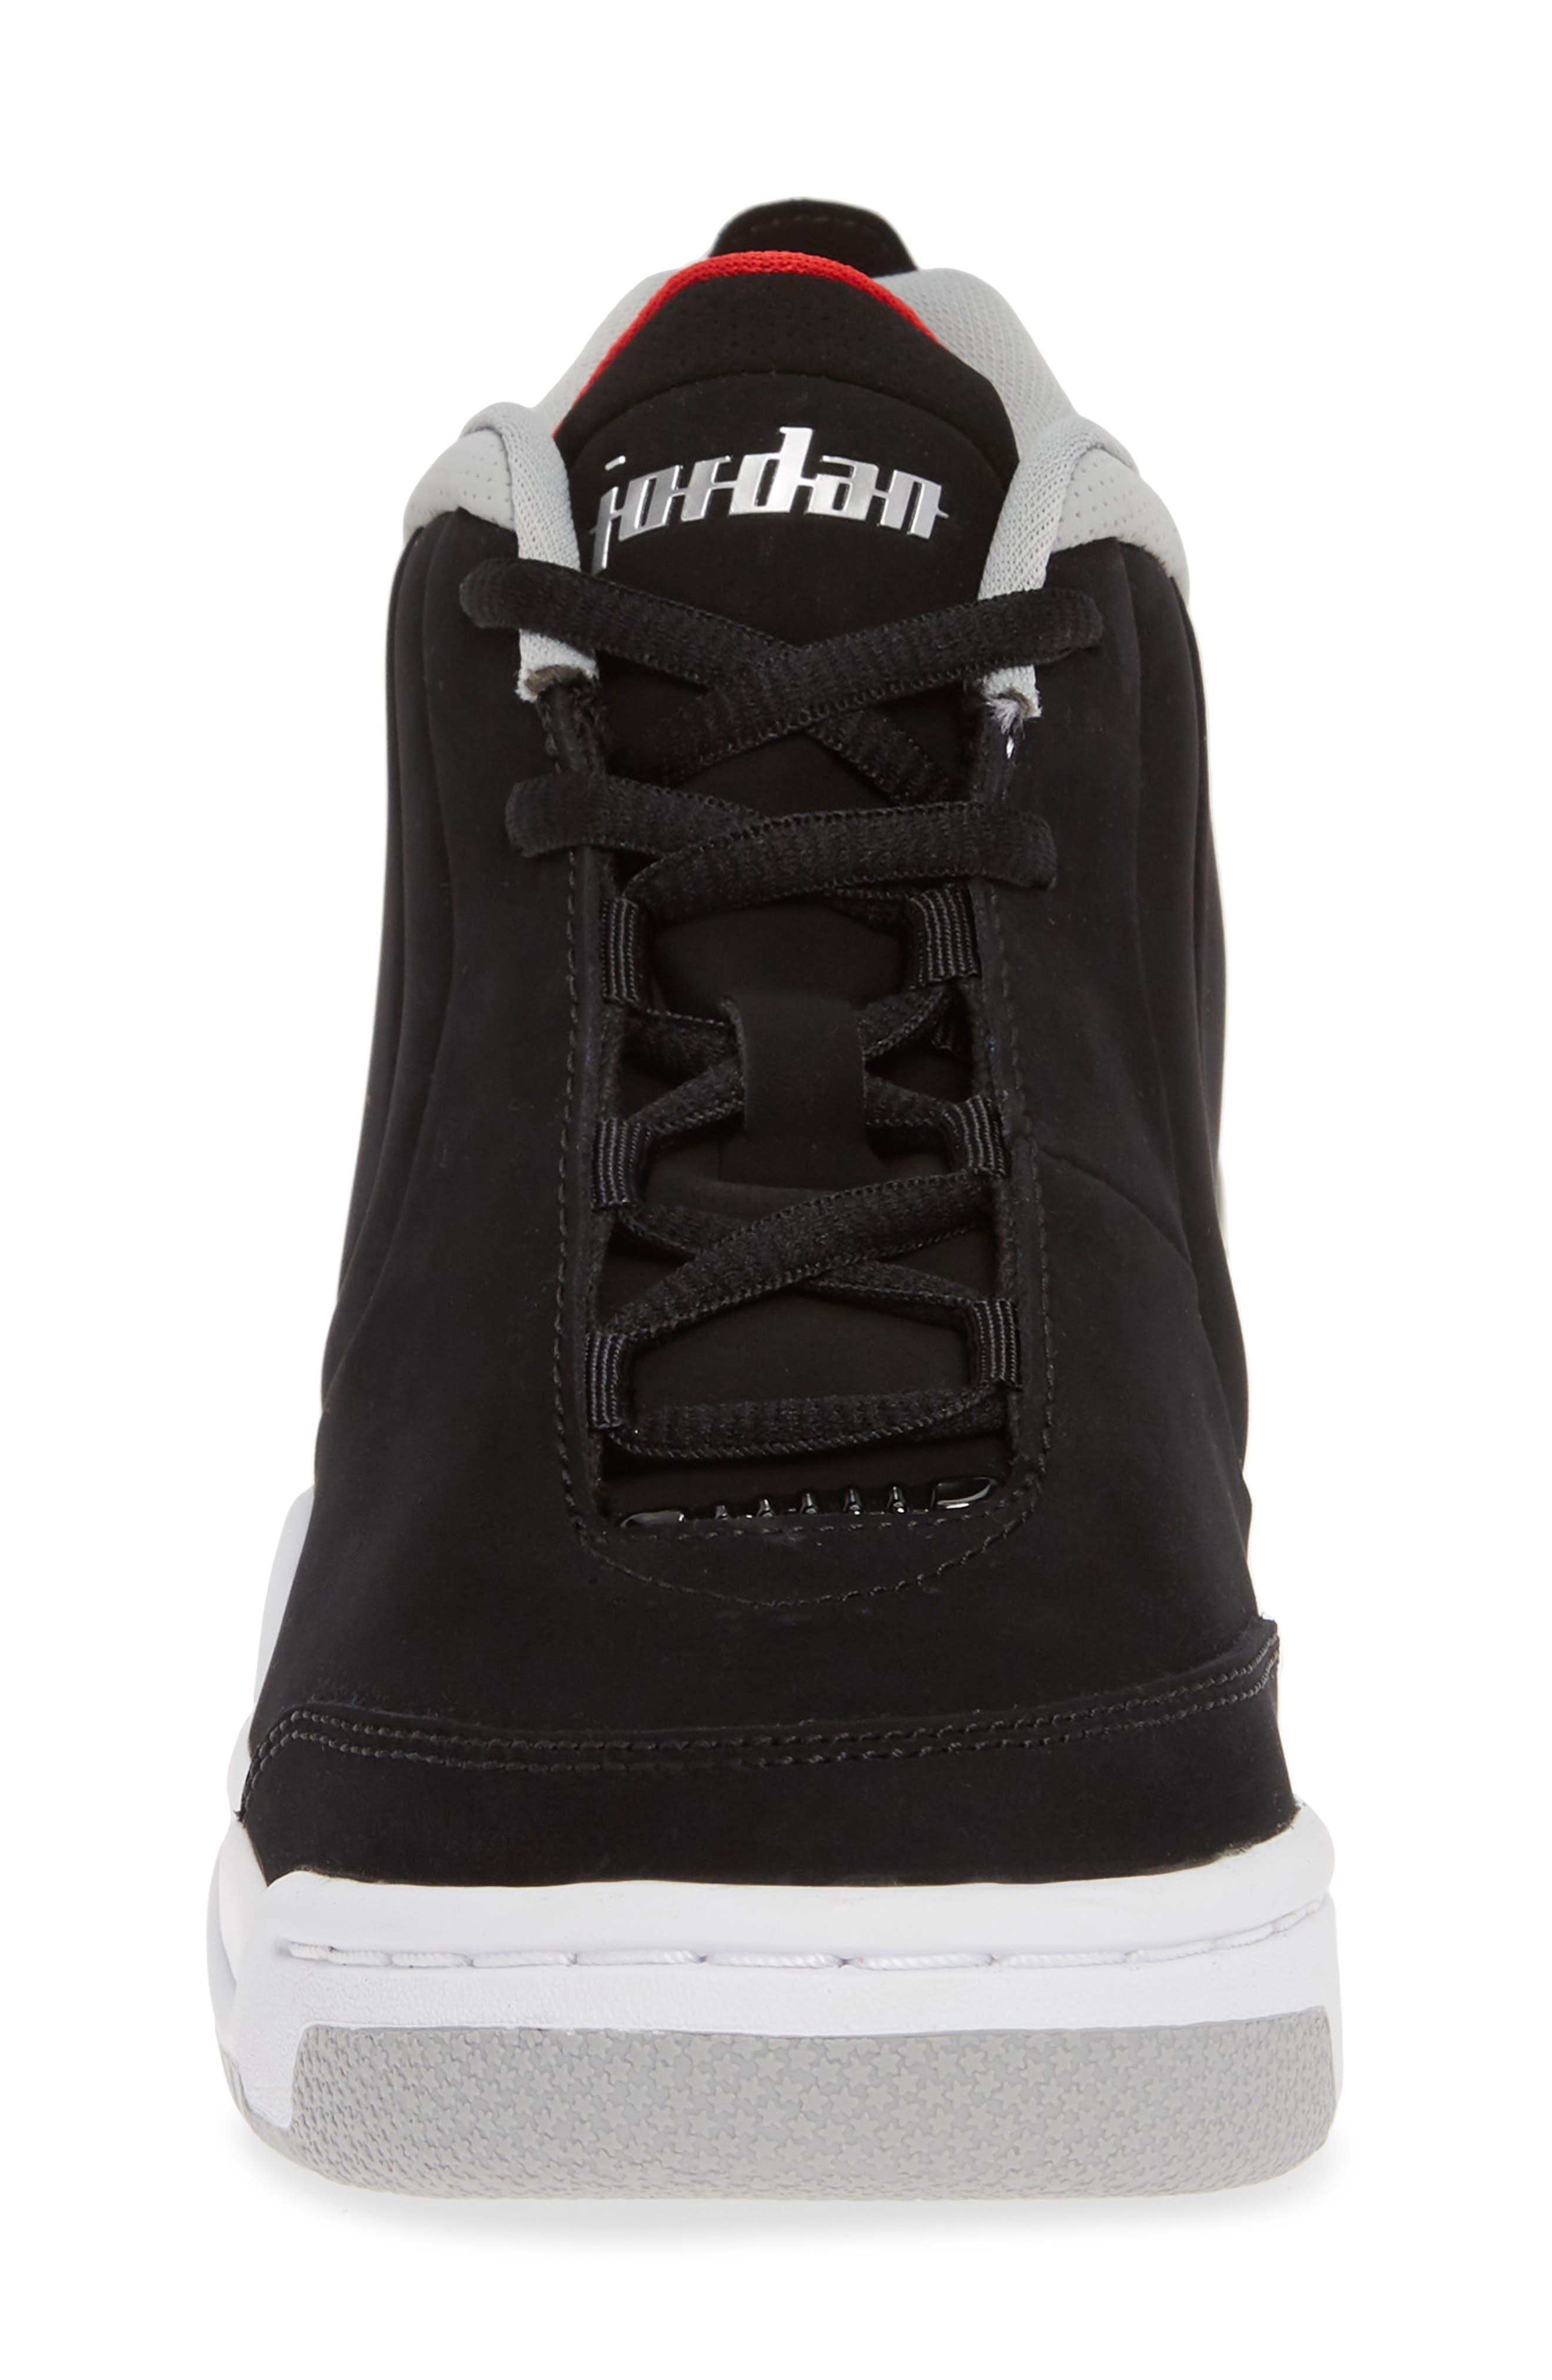 JORDAN, Big Fund Mid Top Basketball Sneaker, Alternate thumbnail 4, color, BLACK/ METALLIC SILVER-WHITE